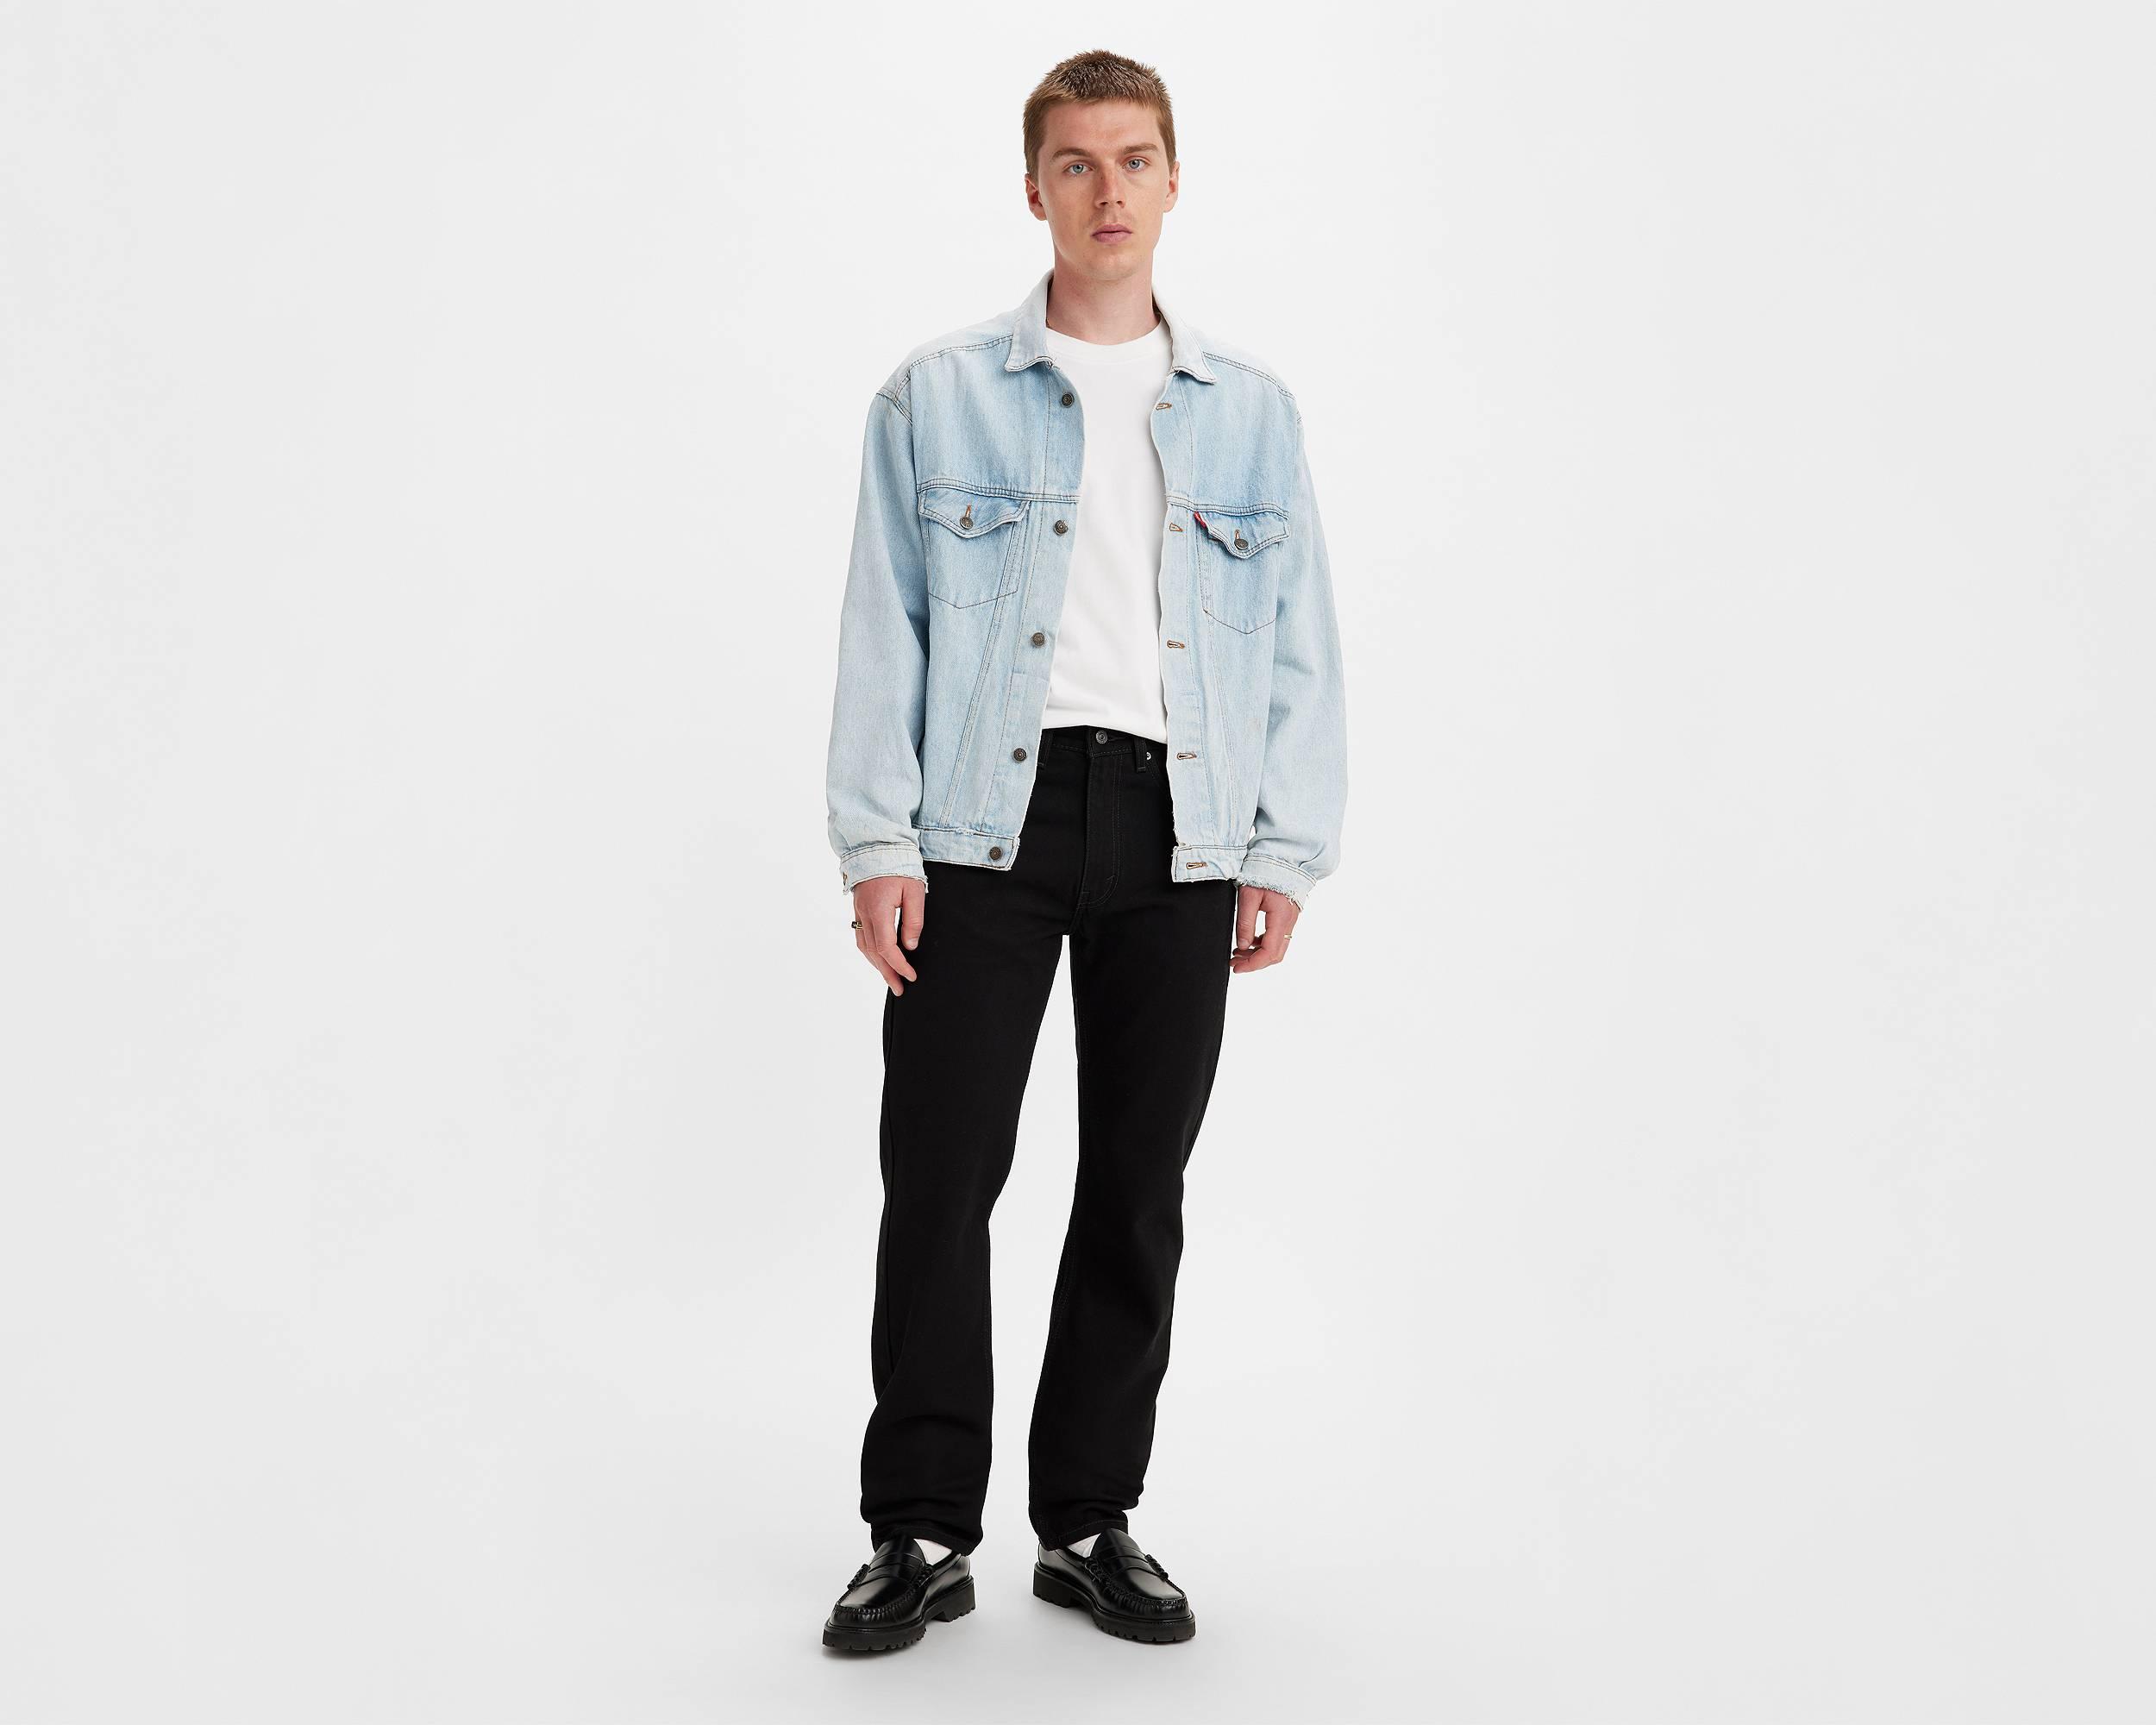 505™ Regular Fit Jeans | Black |Levi's® United States (US)